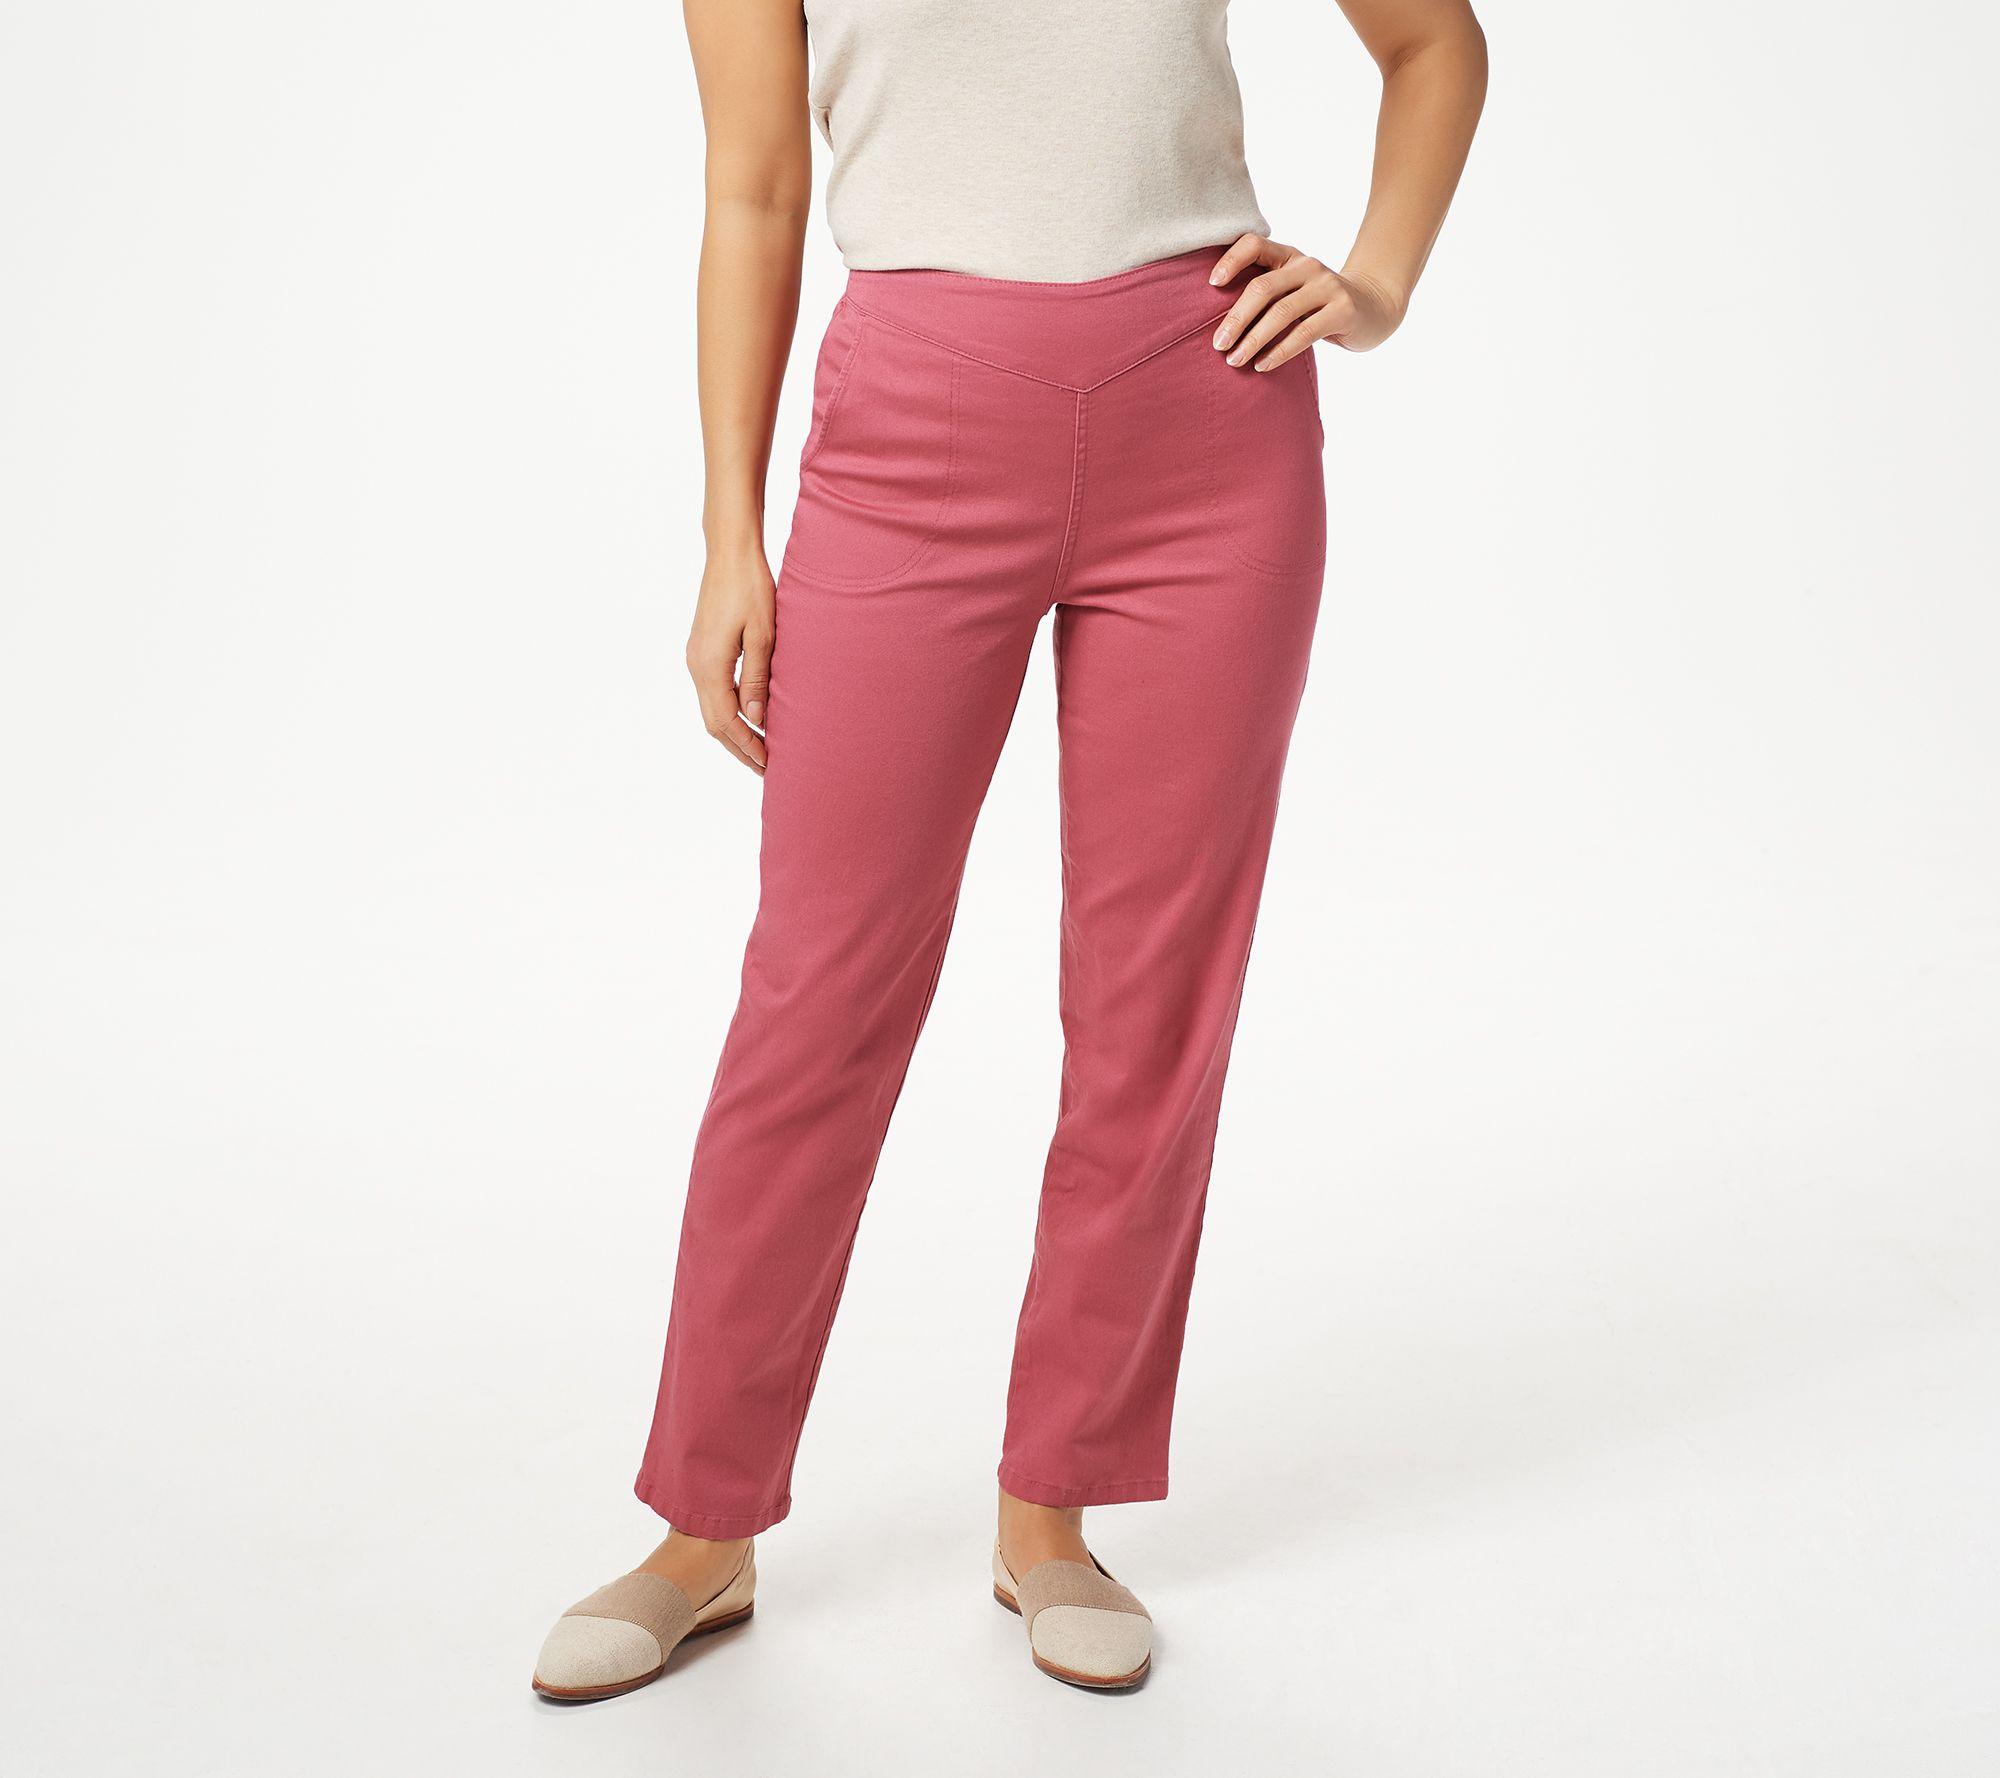 Denim /& Co Pull-On Front V-Yoke Pants Pockets Khaki M NEW A228213